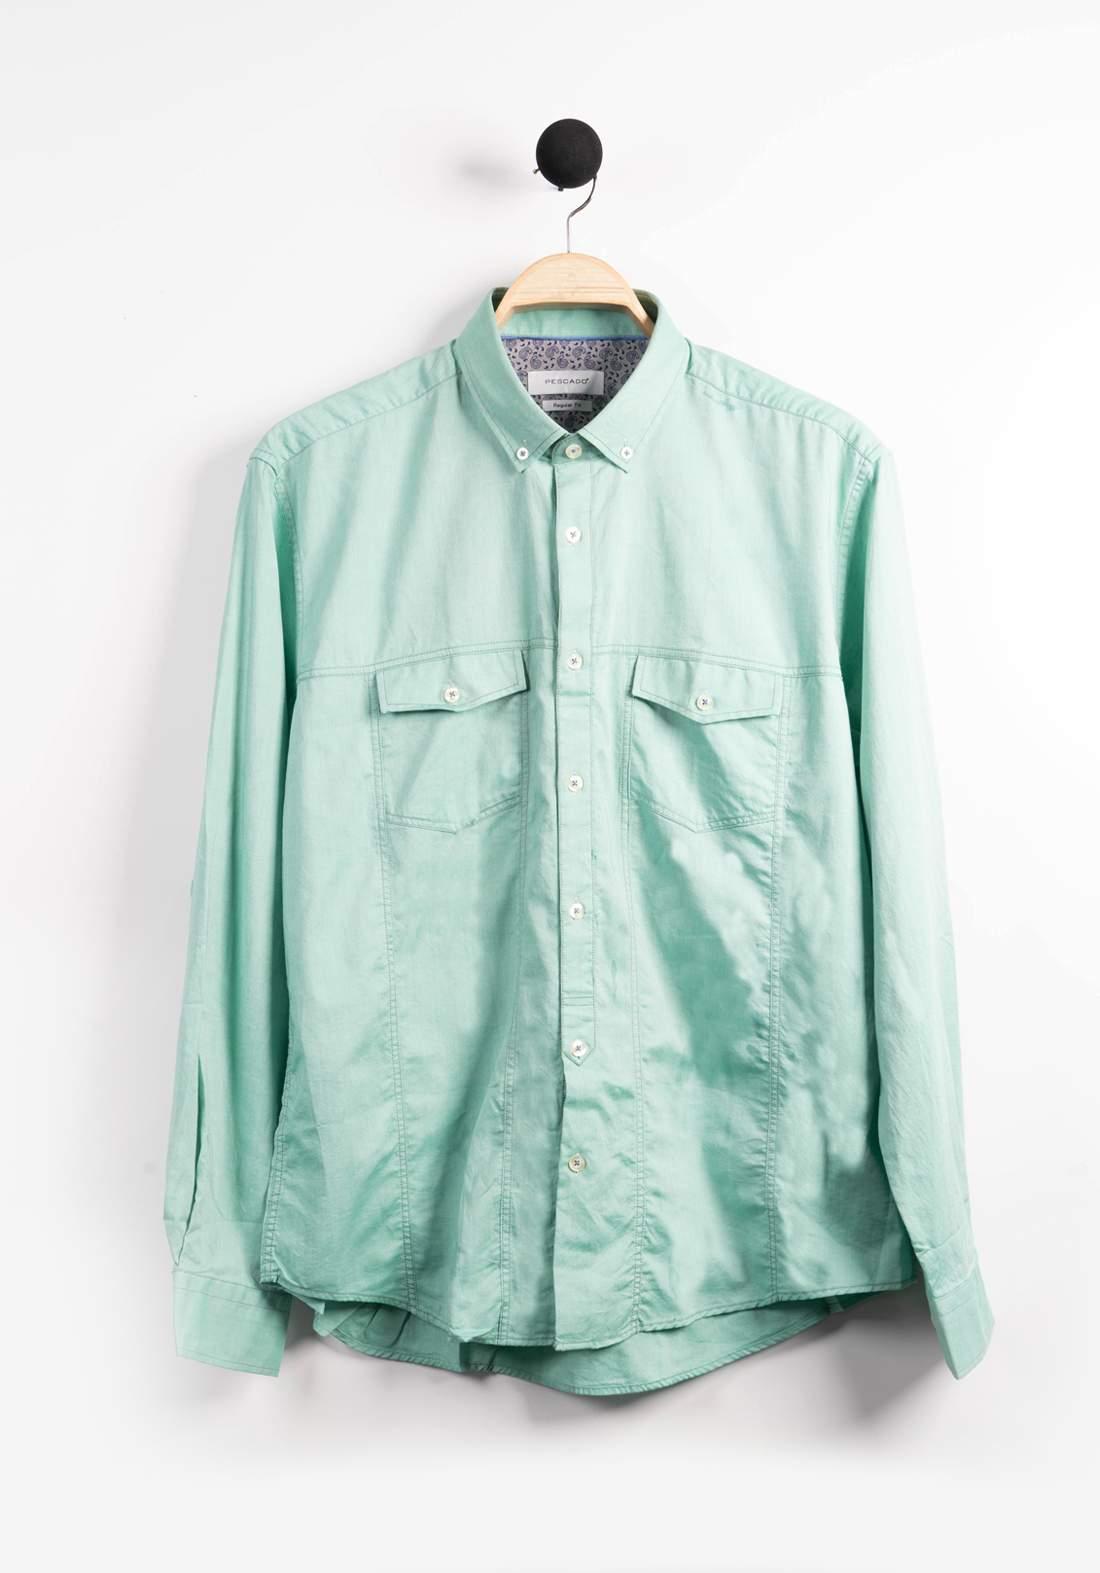 قميص رجالي اخضر اللون